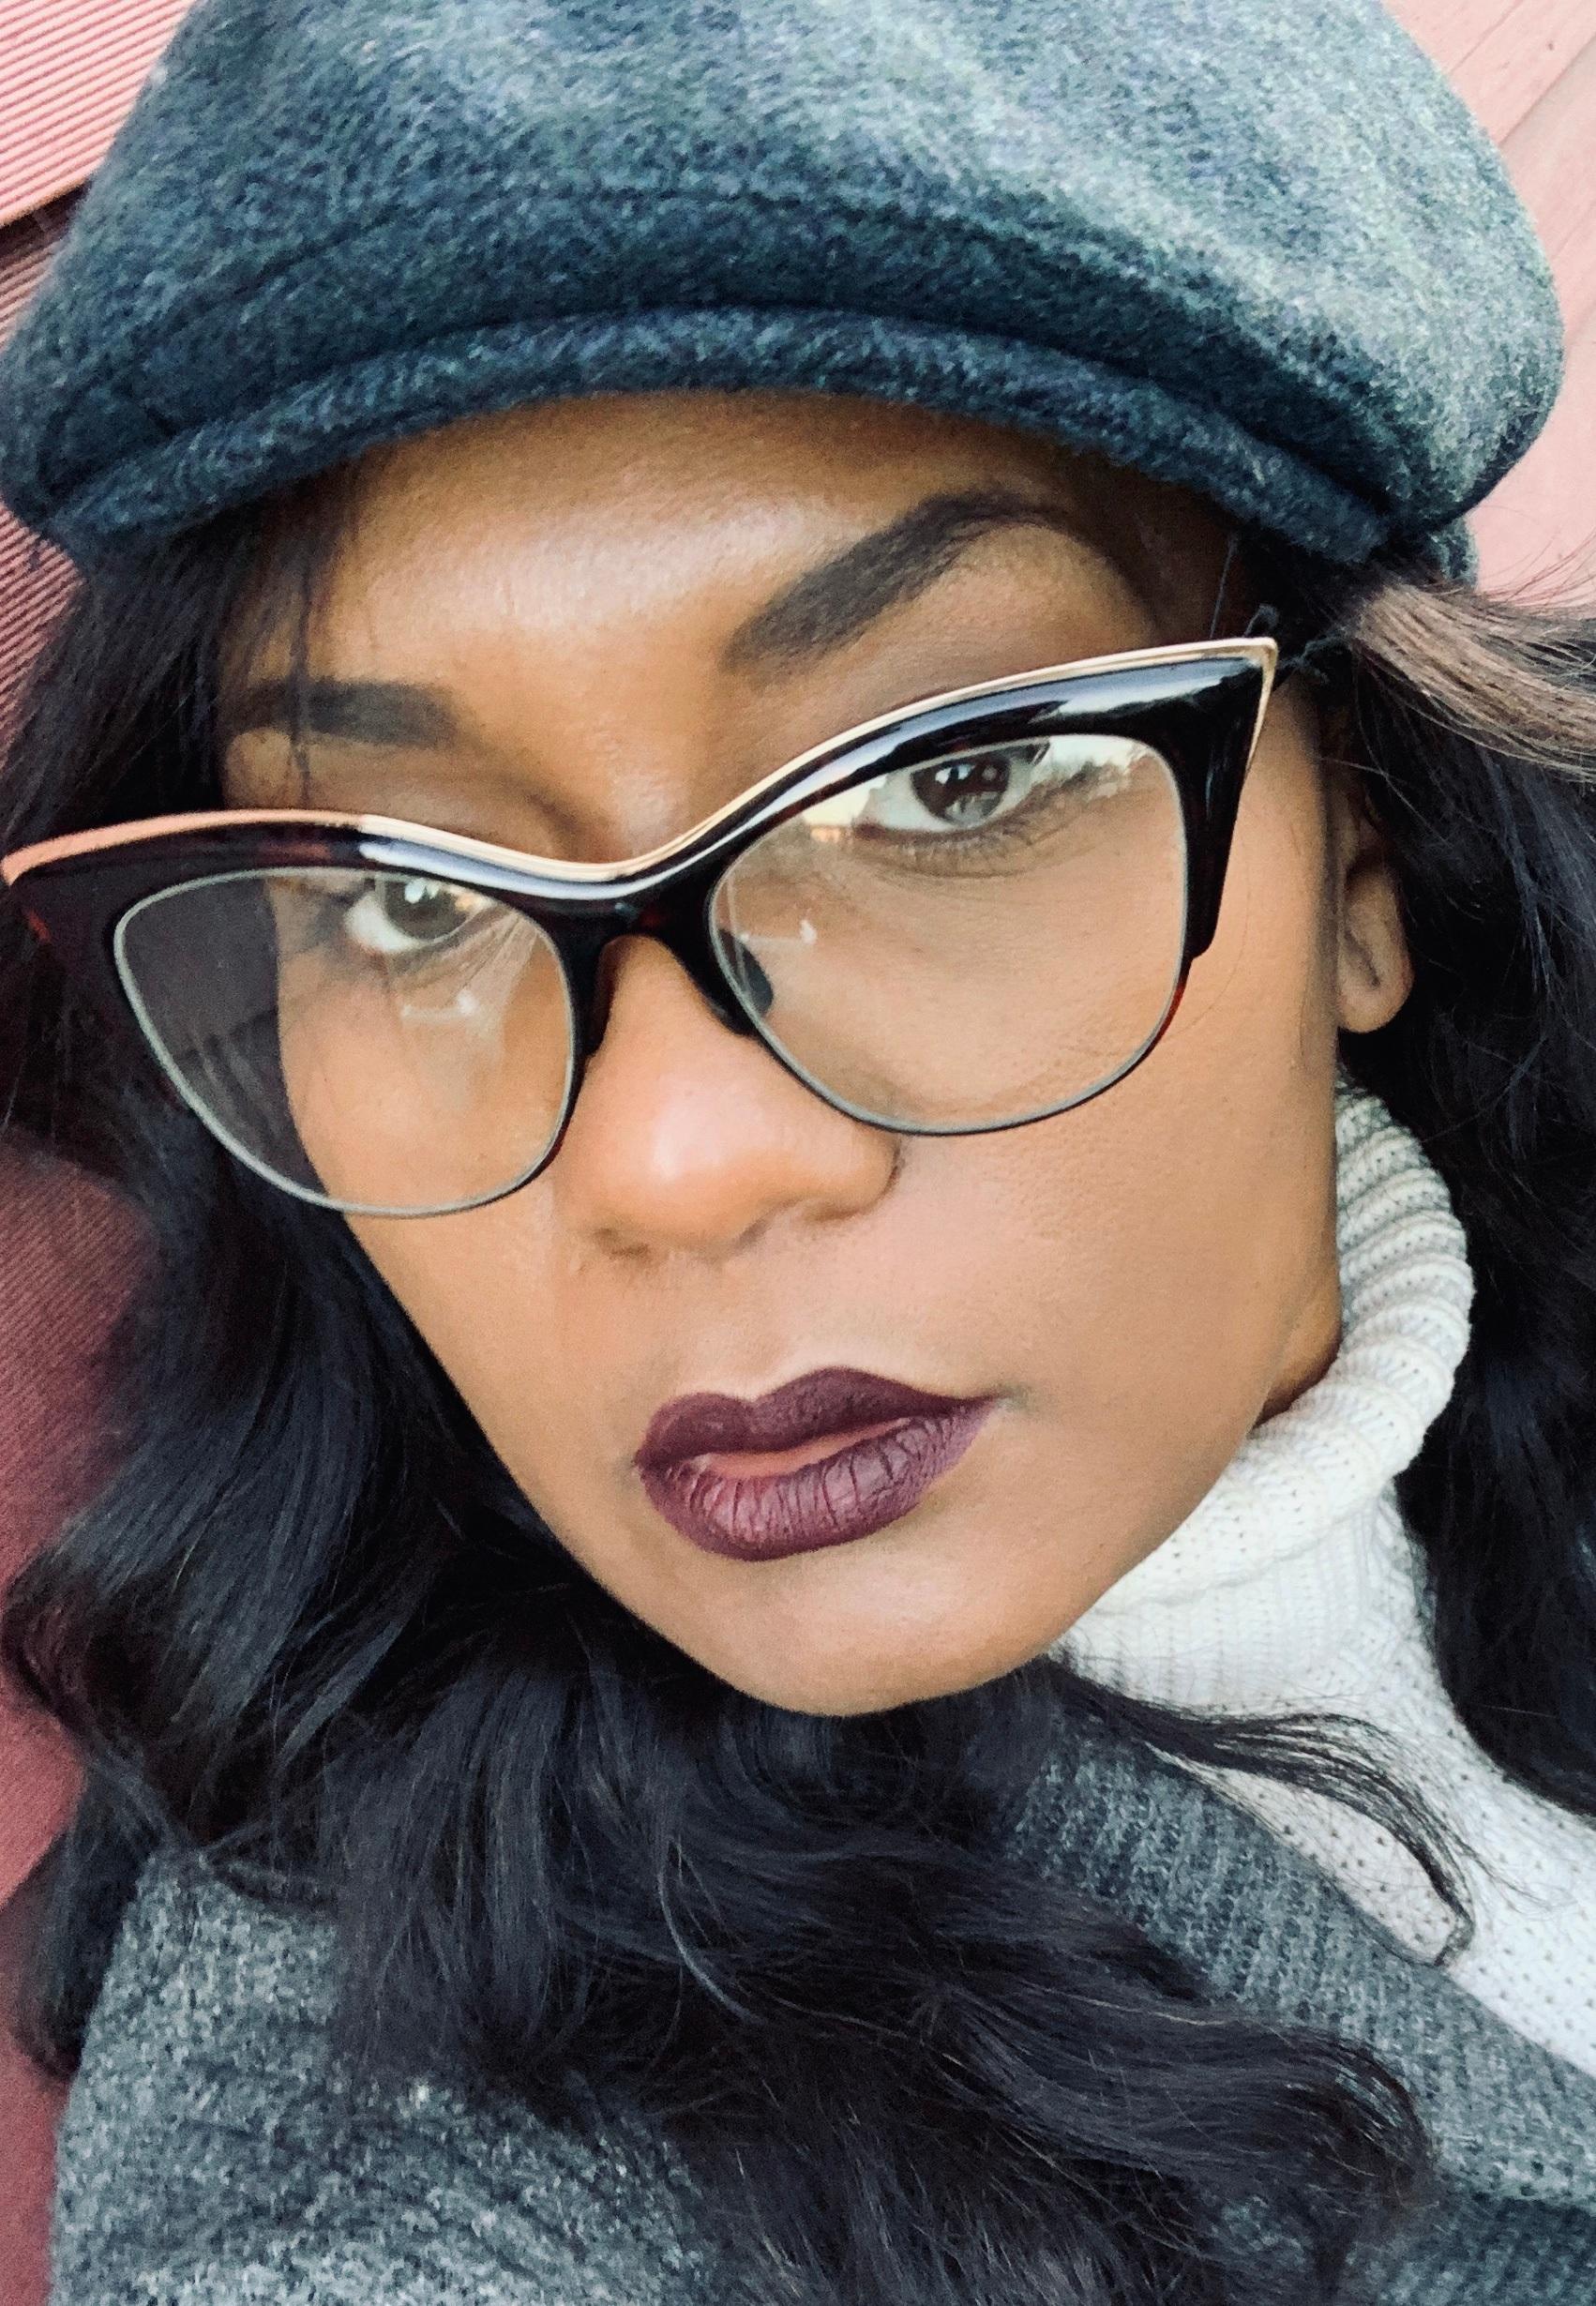 https://www.latinasstyleofelegance.com/product-page/trendy-eyewear